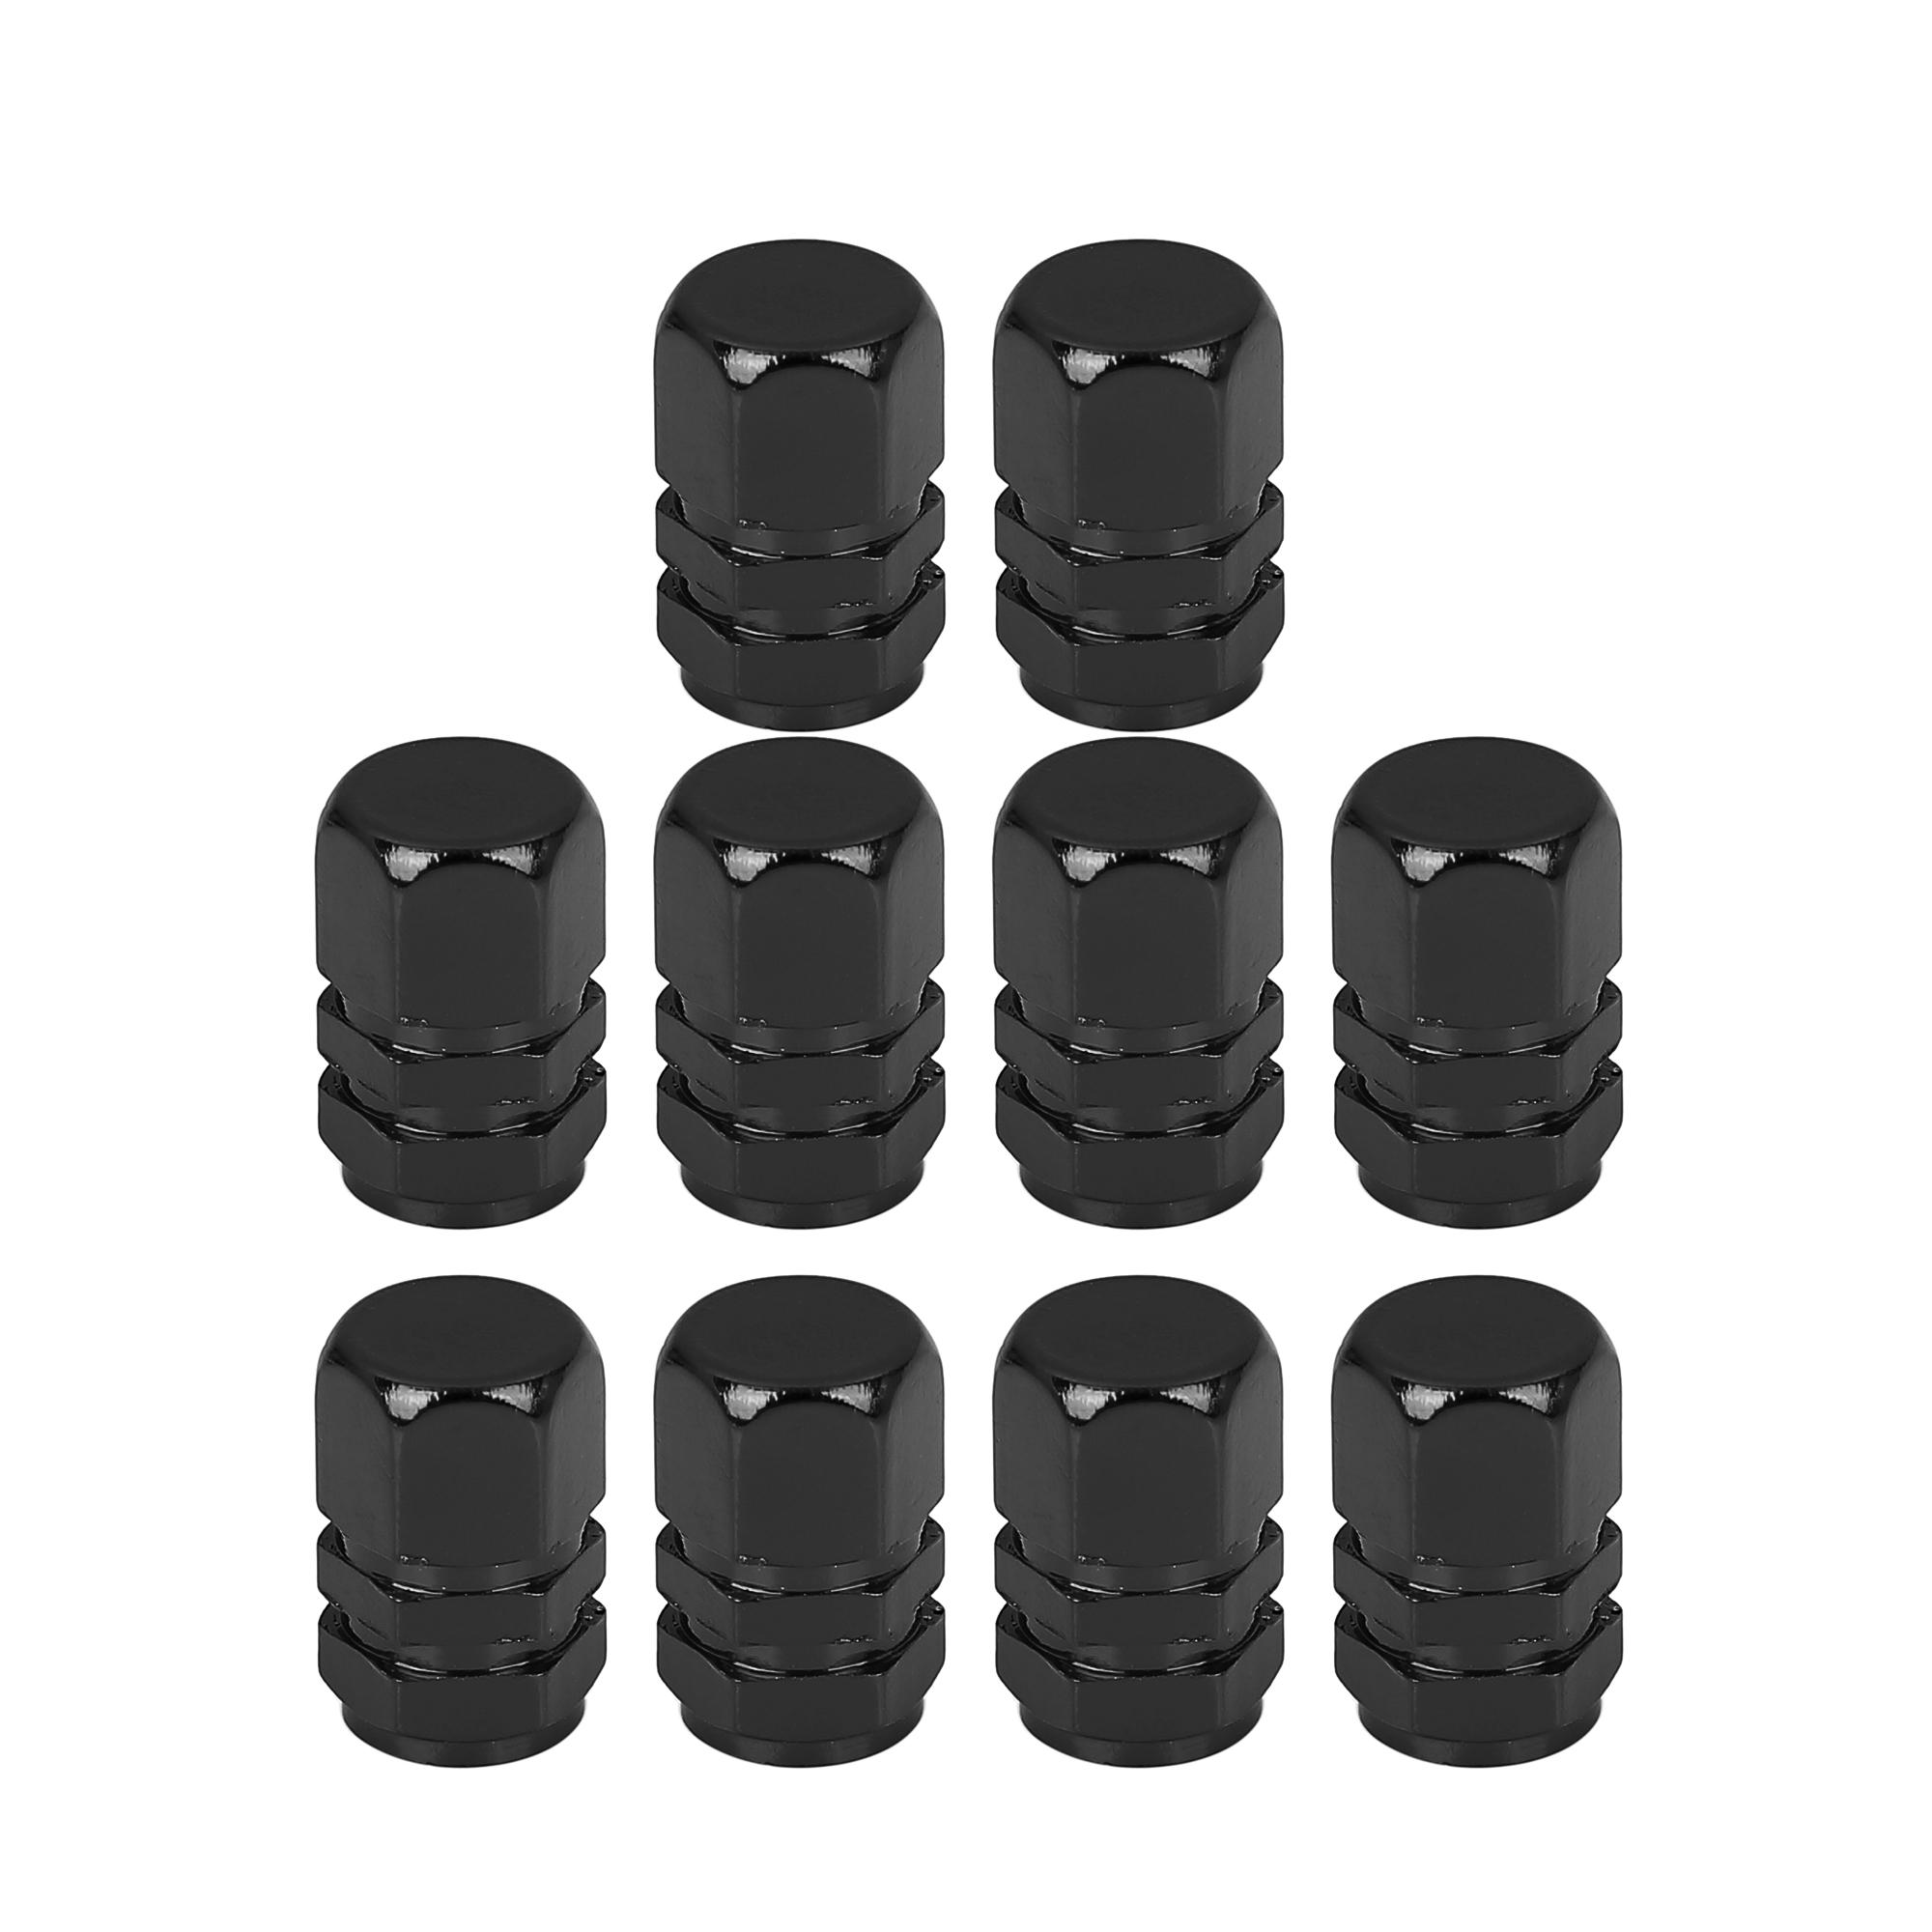 10pcs Black Tire Stem Valve Caps Car Hexagon Shape Aluminium Alloy Trie Cap